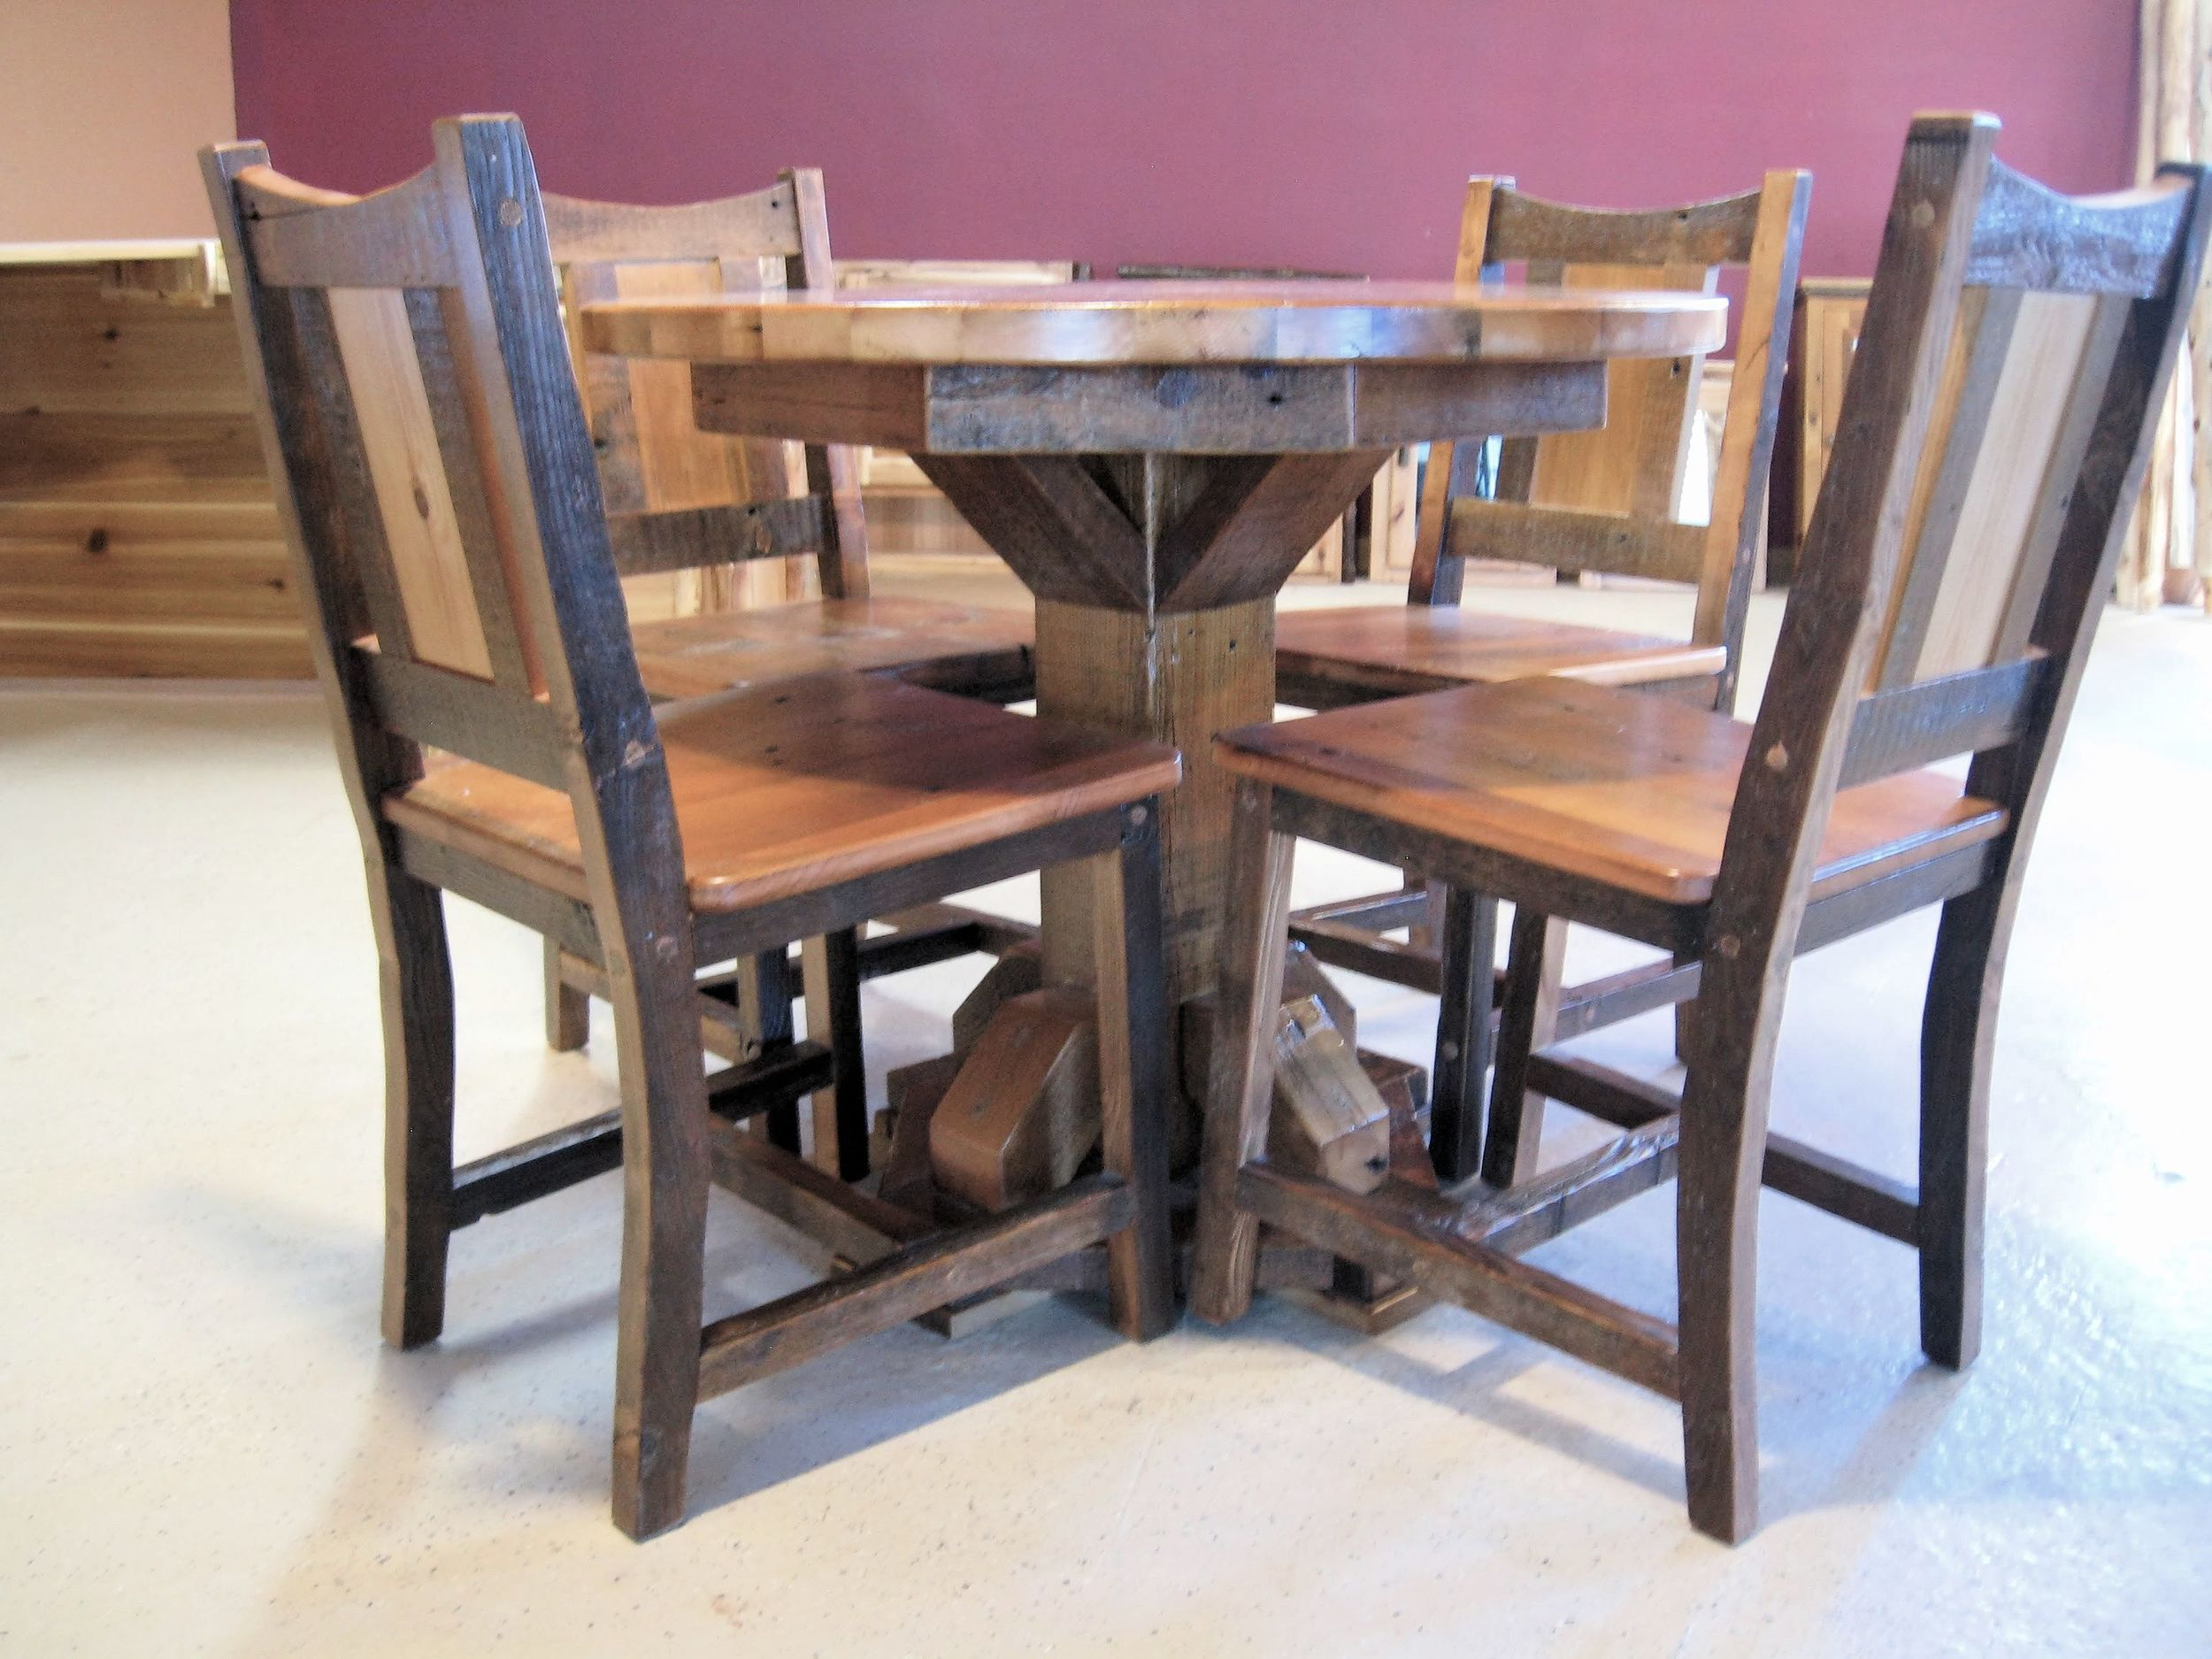 Barn-wood-table-chairs.jpg